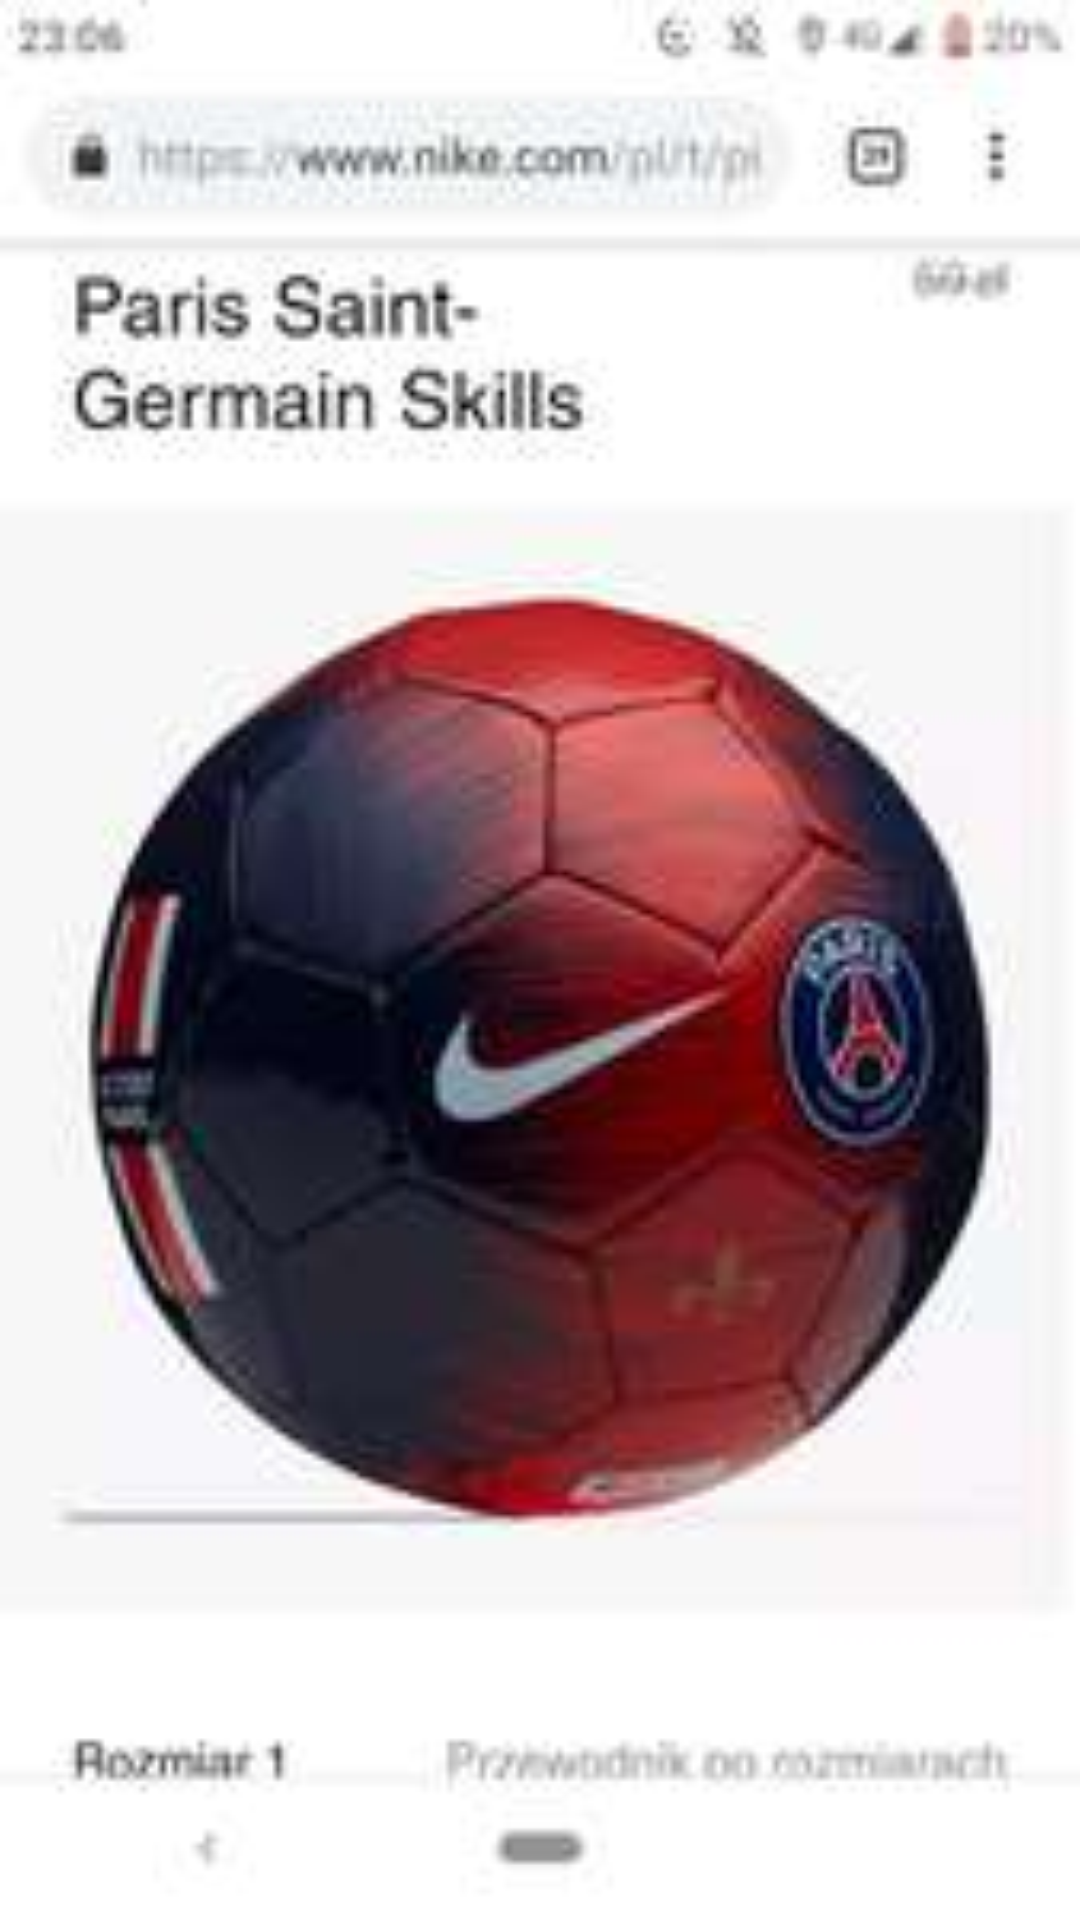 Piłka do piłki nożnej Nike Paris Saint- Germain Skills